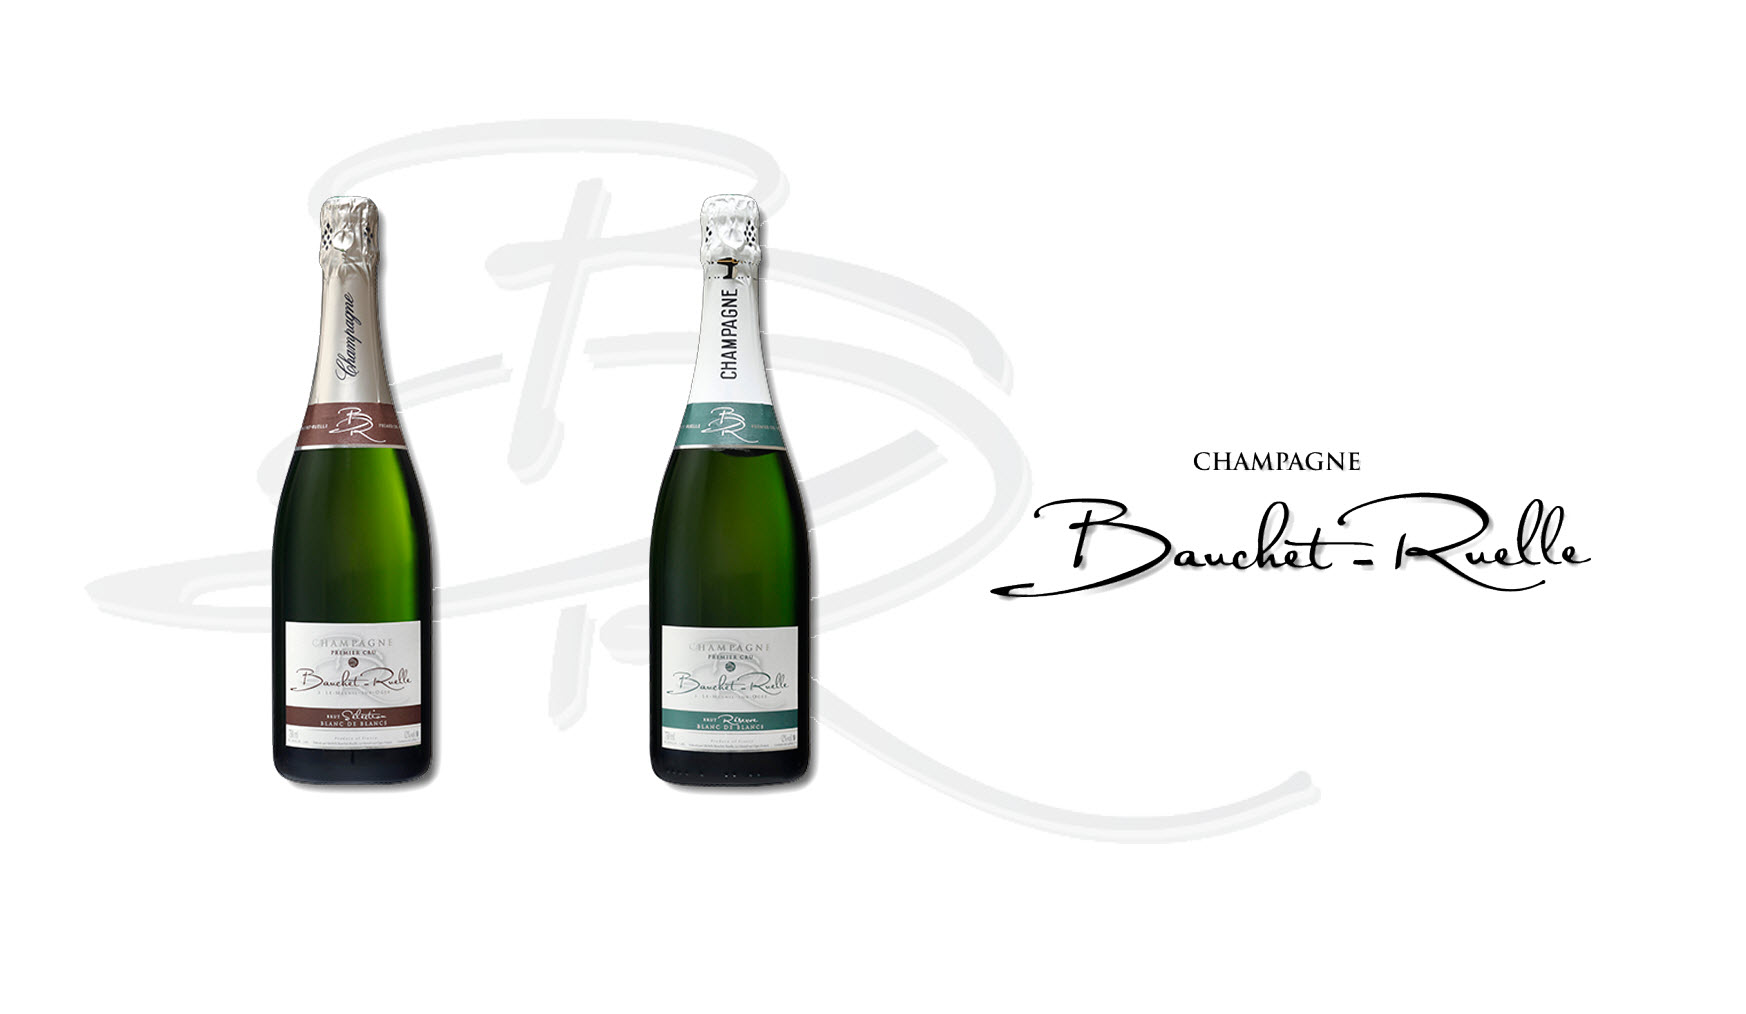 Champagne Bauchet-Ruelle